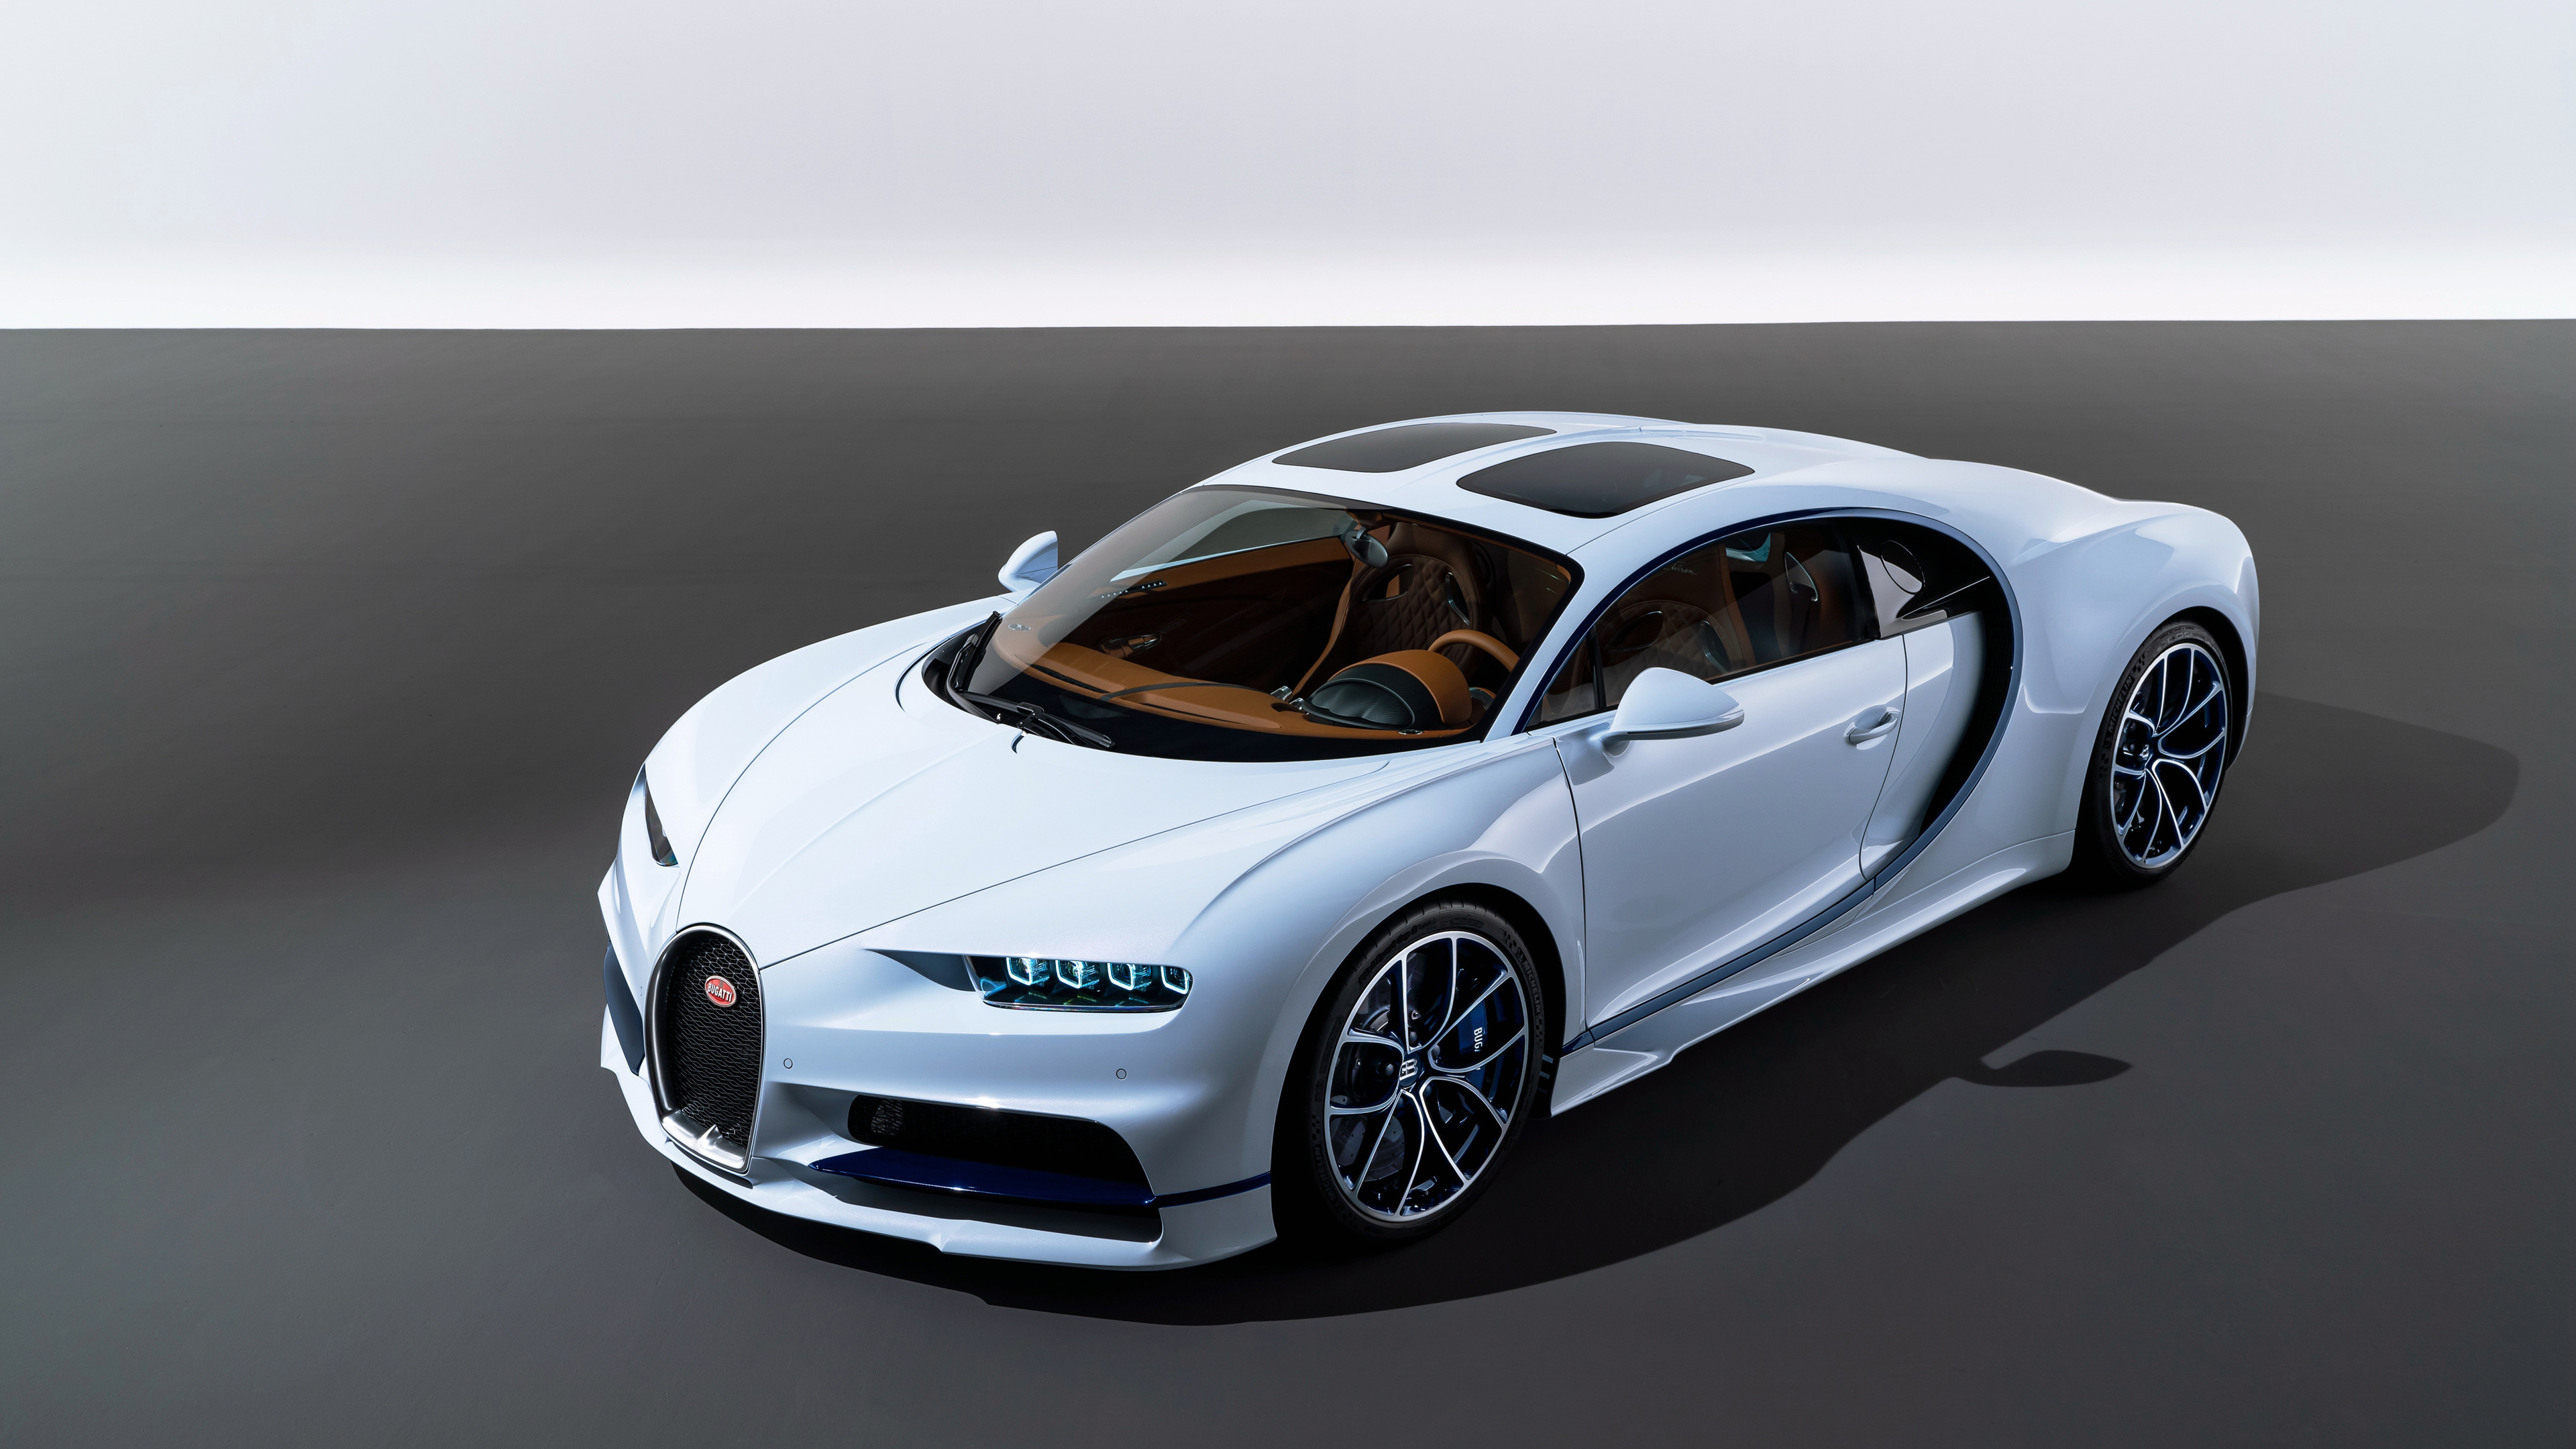 2018 bugatti chiron sky view 1539792837 - 2018 Bugatti Chiron Sky View - hd-wallpapers, cars wallpapers, bugatti chiron wallpapers, bugatti chiron sky view wallpapers, 4k-wallpapers, 2018 cars wallpapers